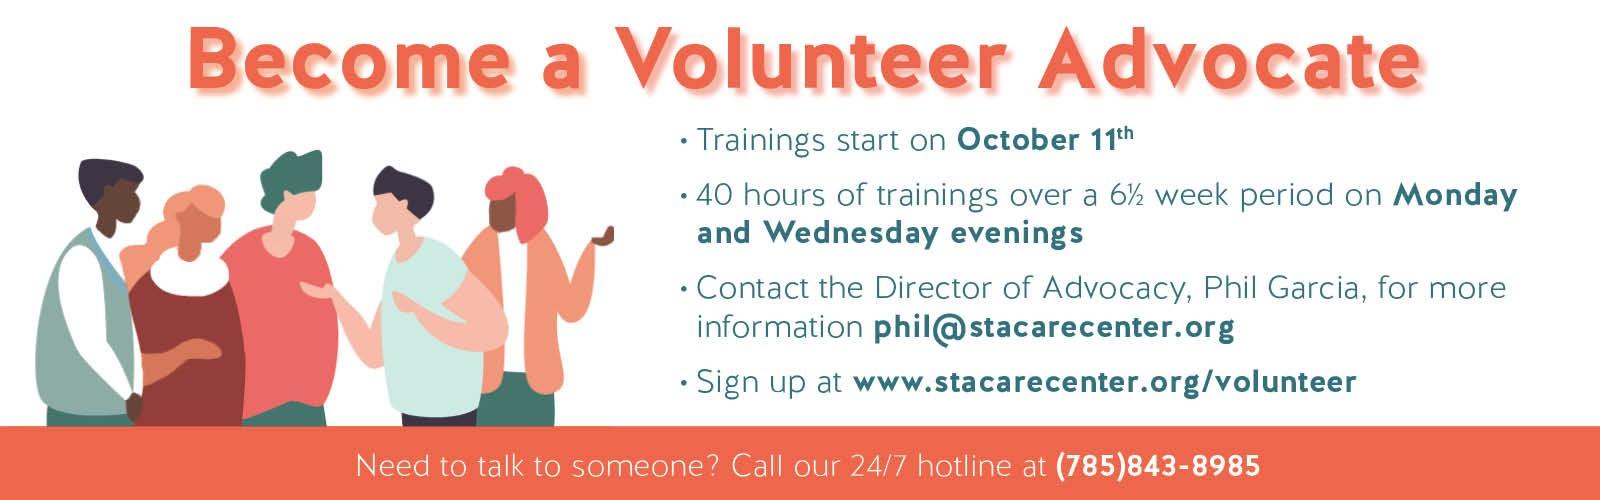 Become A Volunteer Web Banner